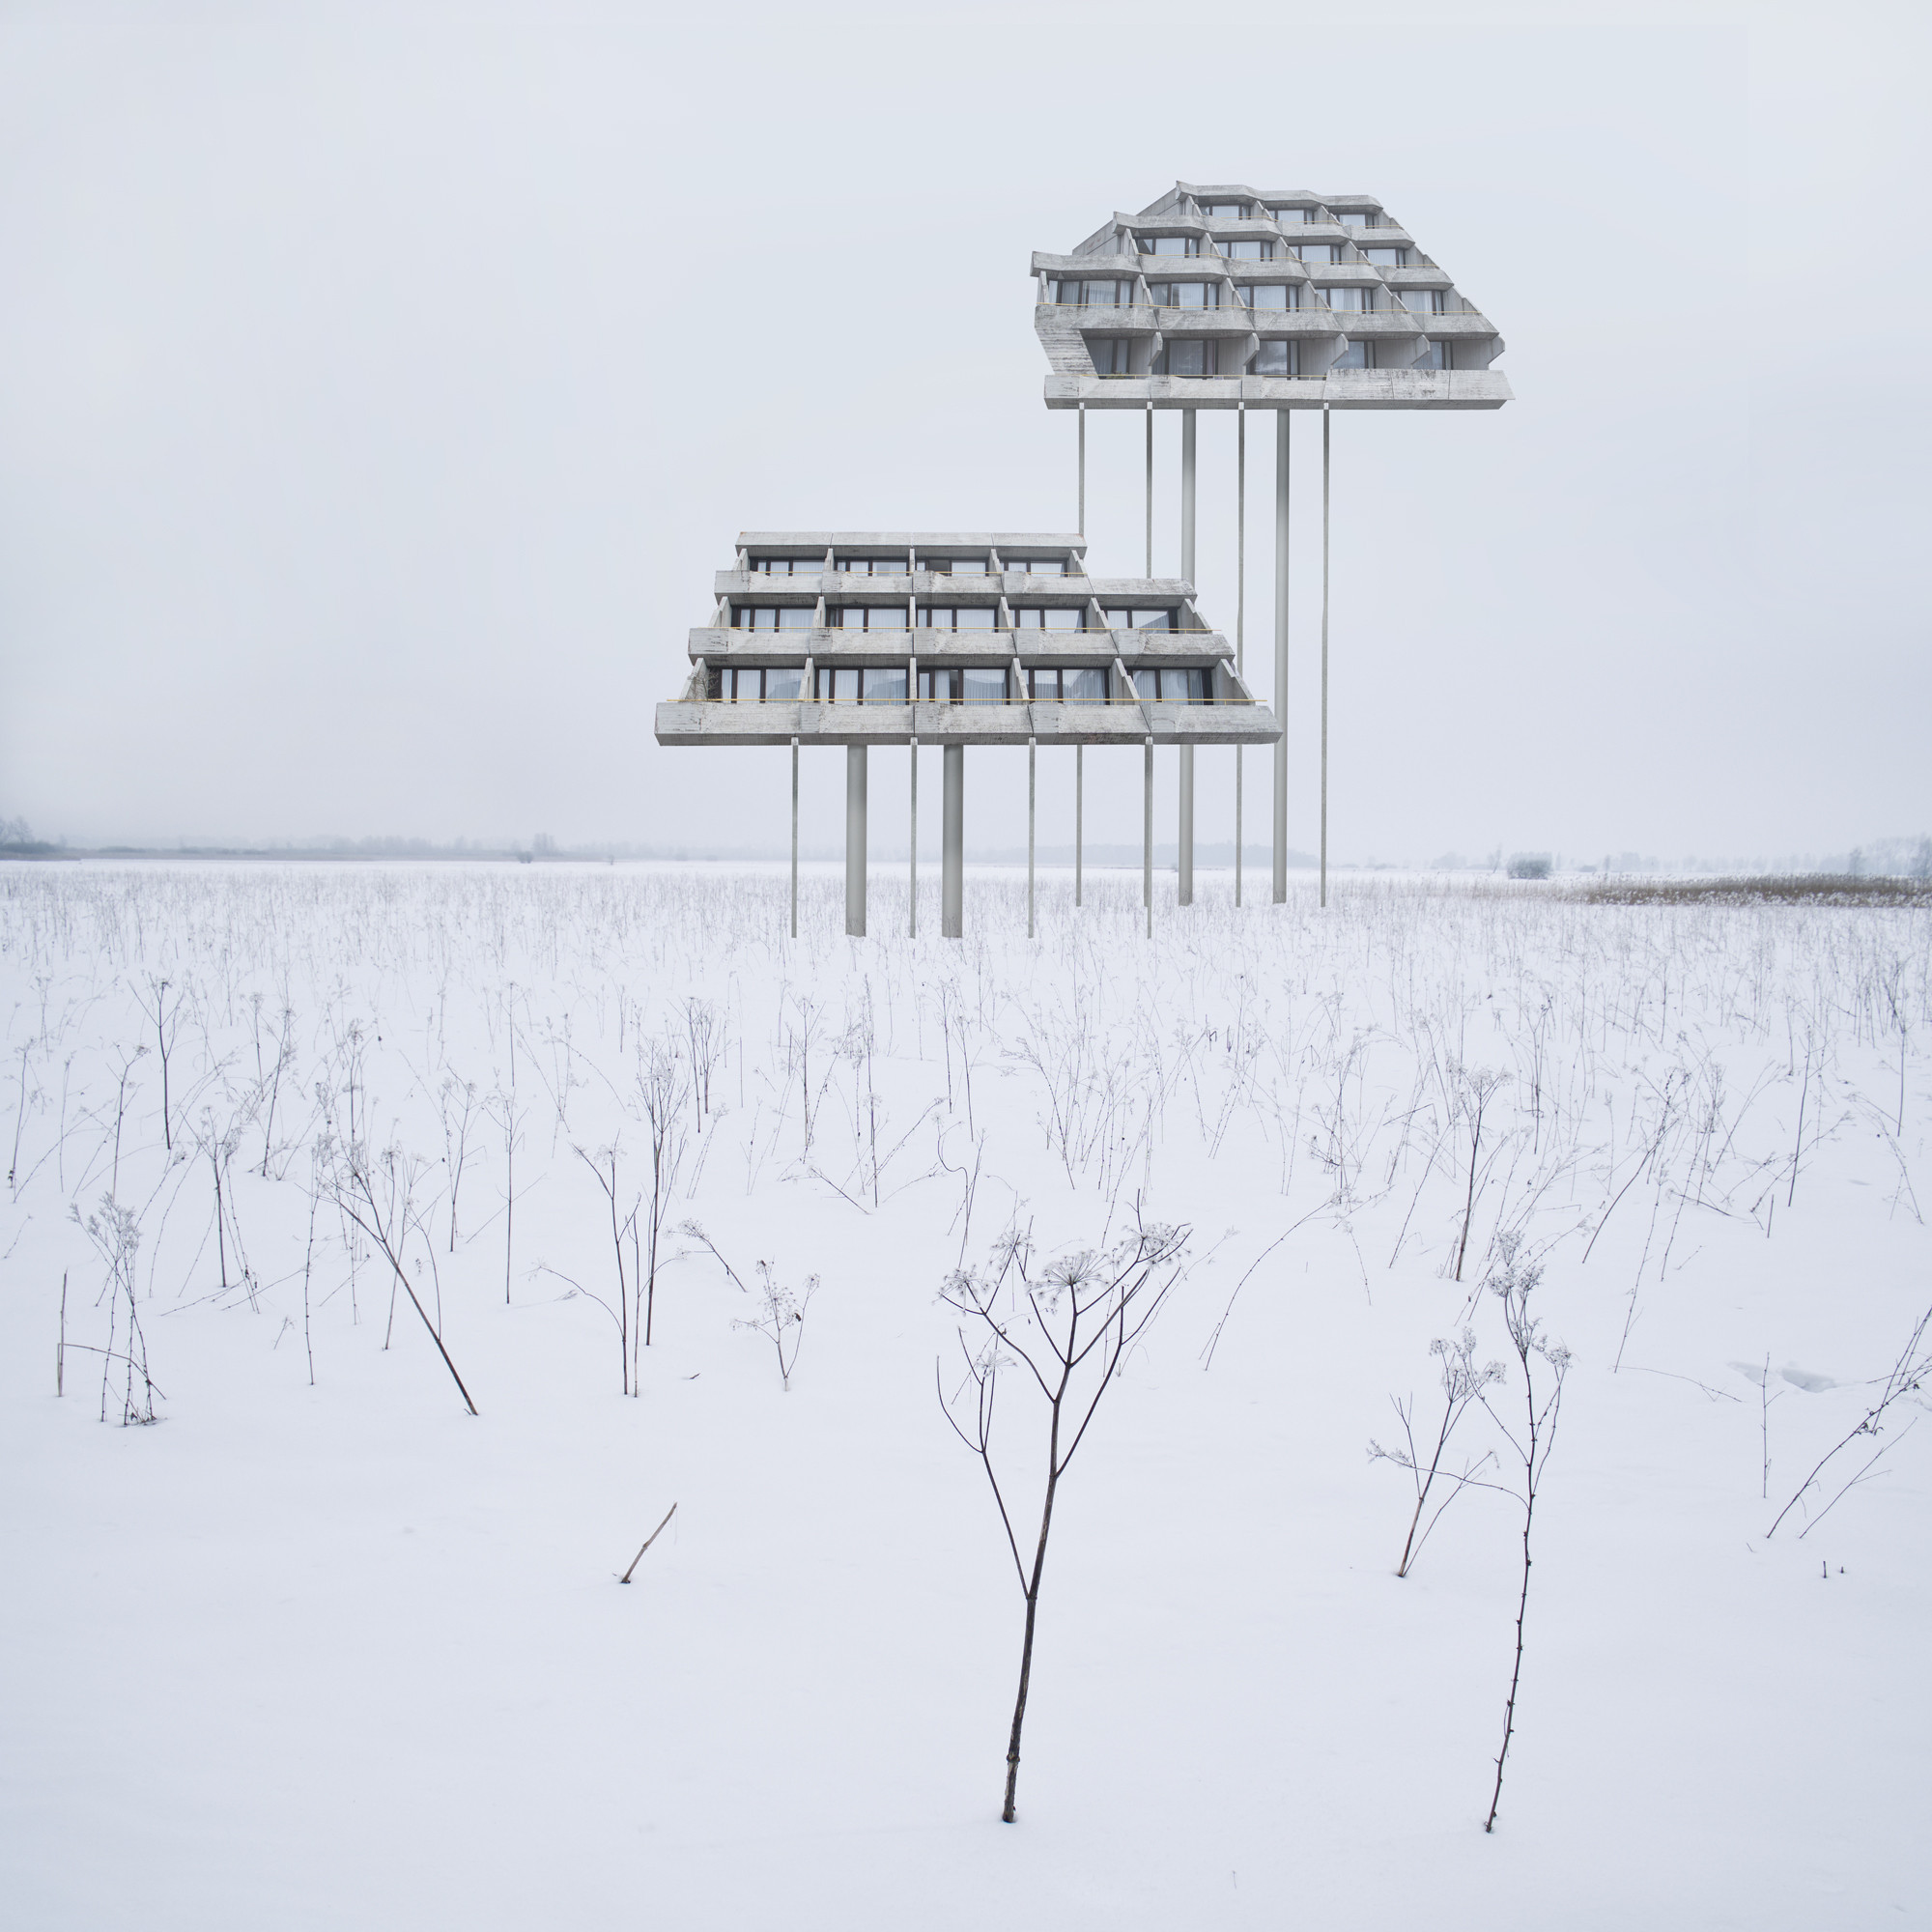 Emigration Office. Imagen © Matthias Jung